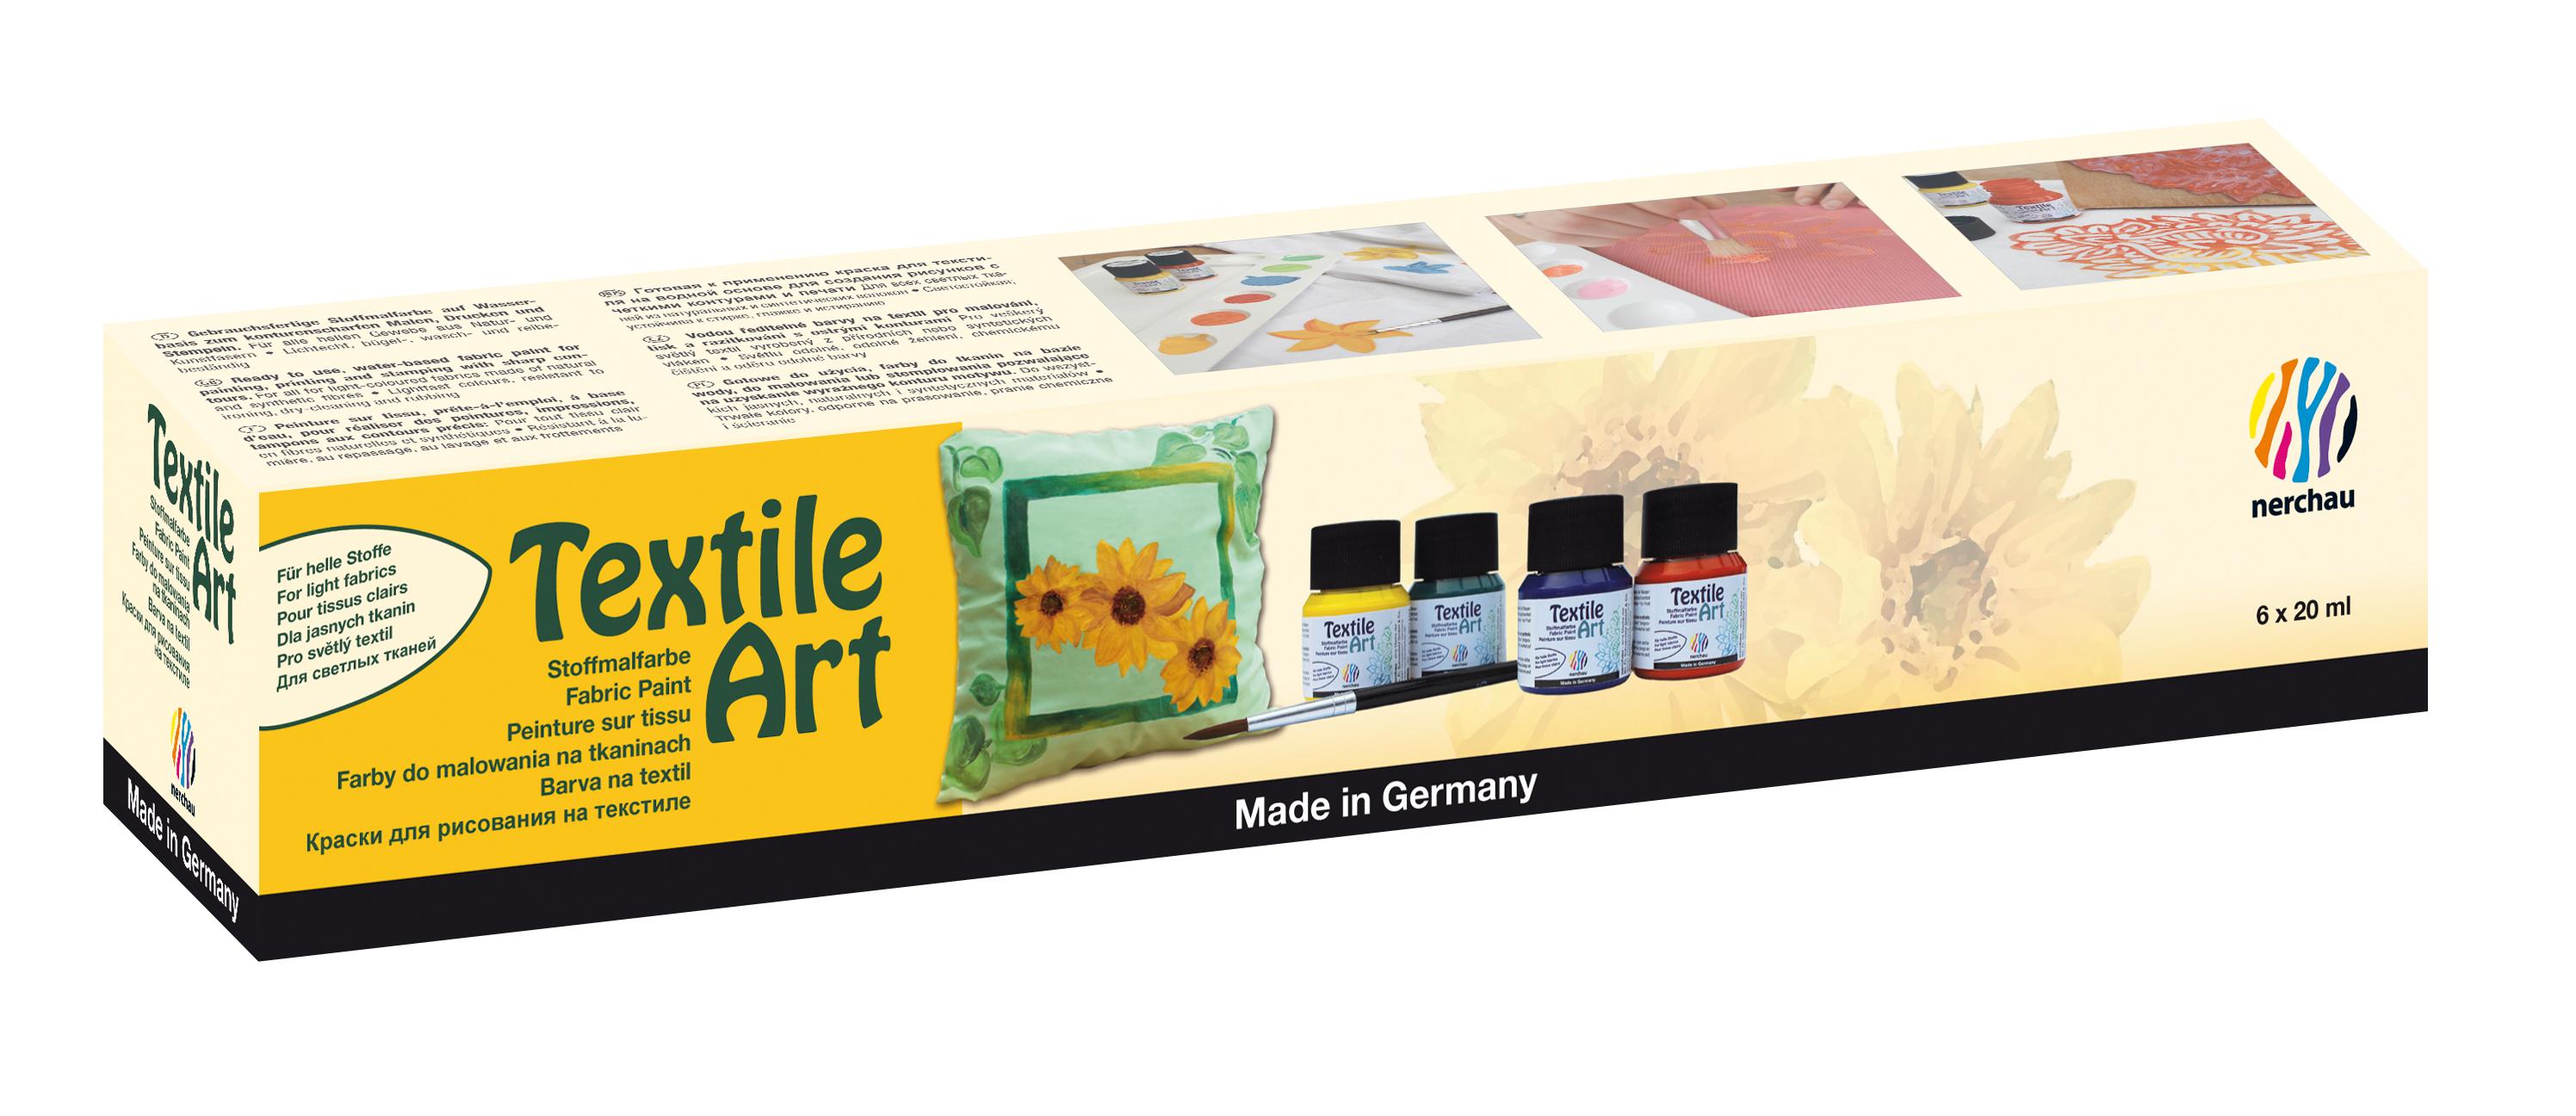 Textile Art, 6er-Set, für helle Stoffe